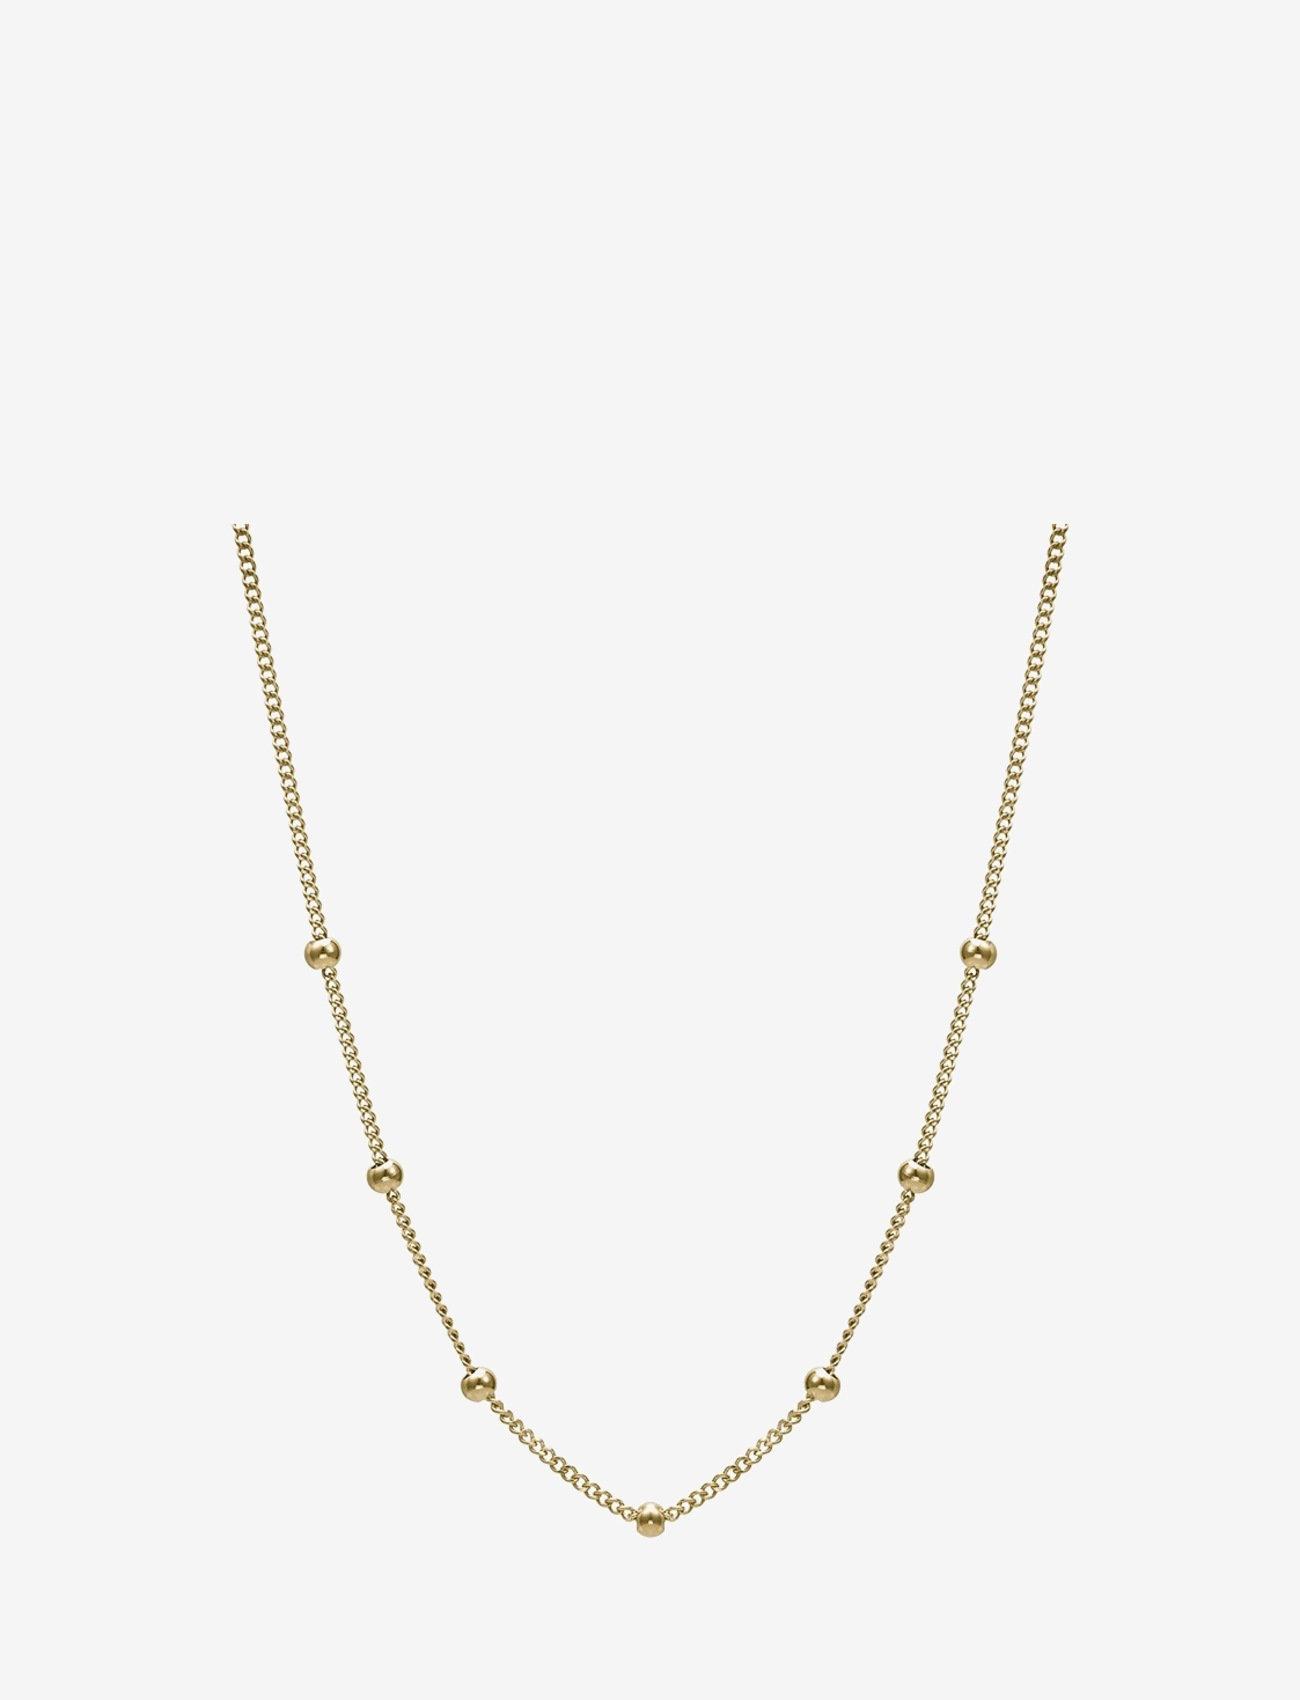 Bud to rose - Globe Choker Necklace Steel - kettingen met hanger - gold - 0